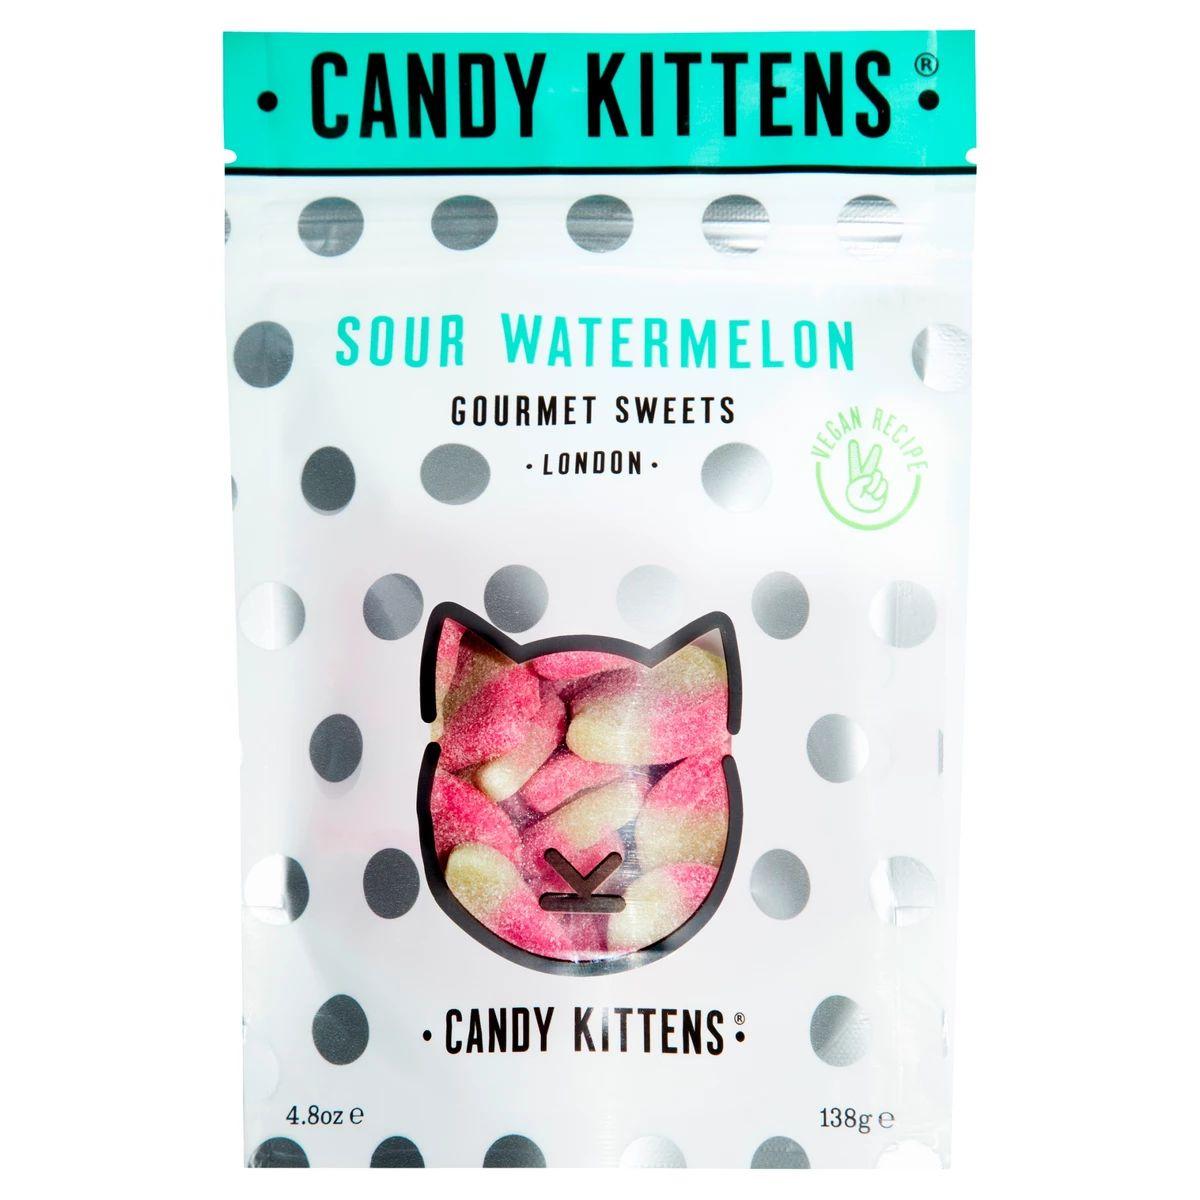 Candy kittens vegan gourmet sweets 120grams various flavours £1.50 @ Asda